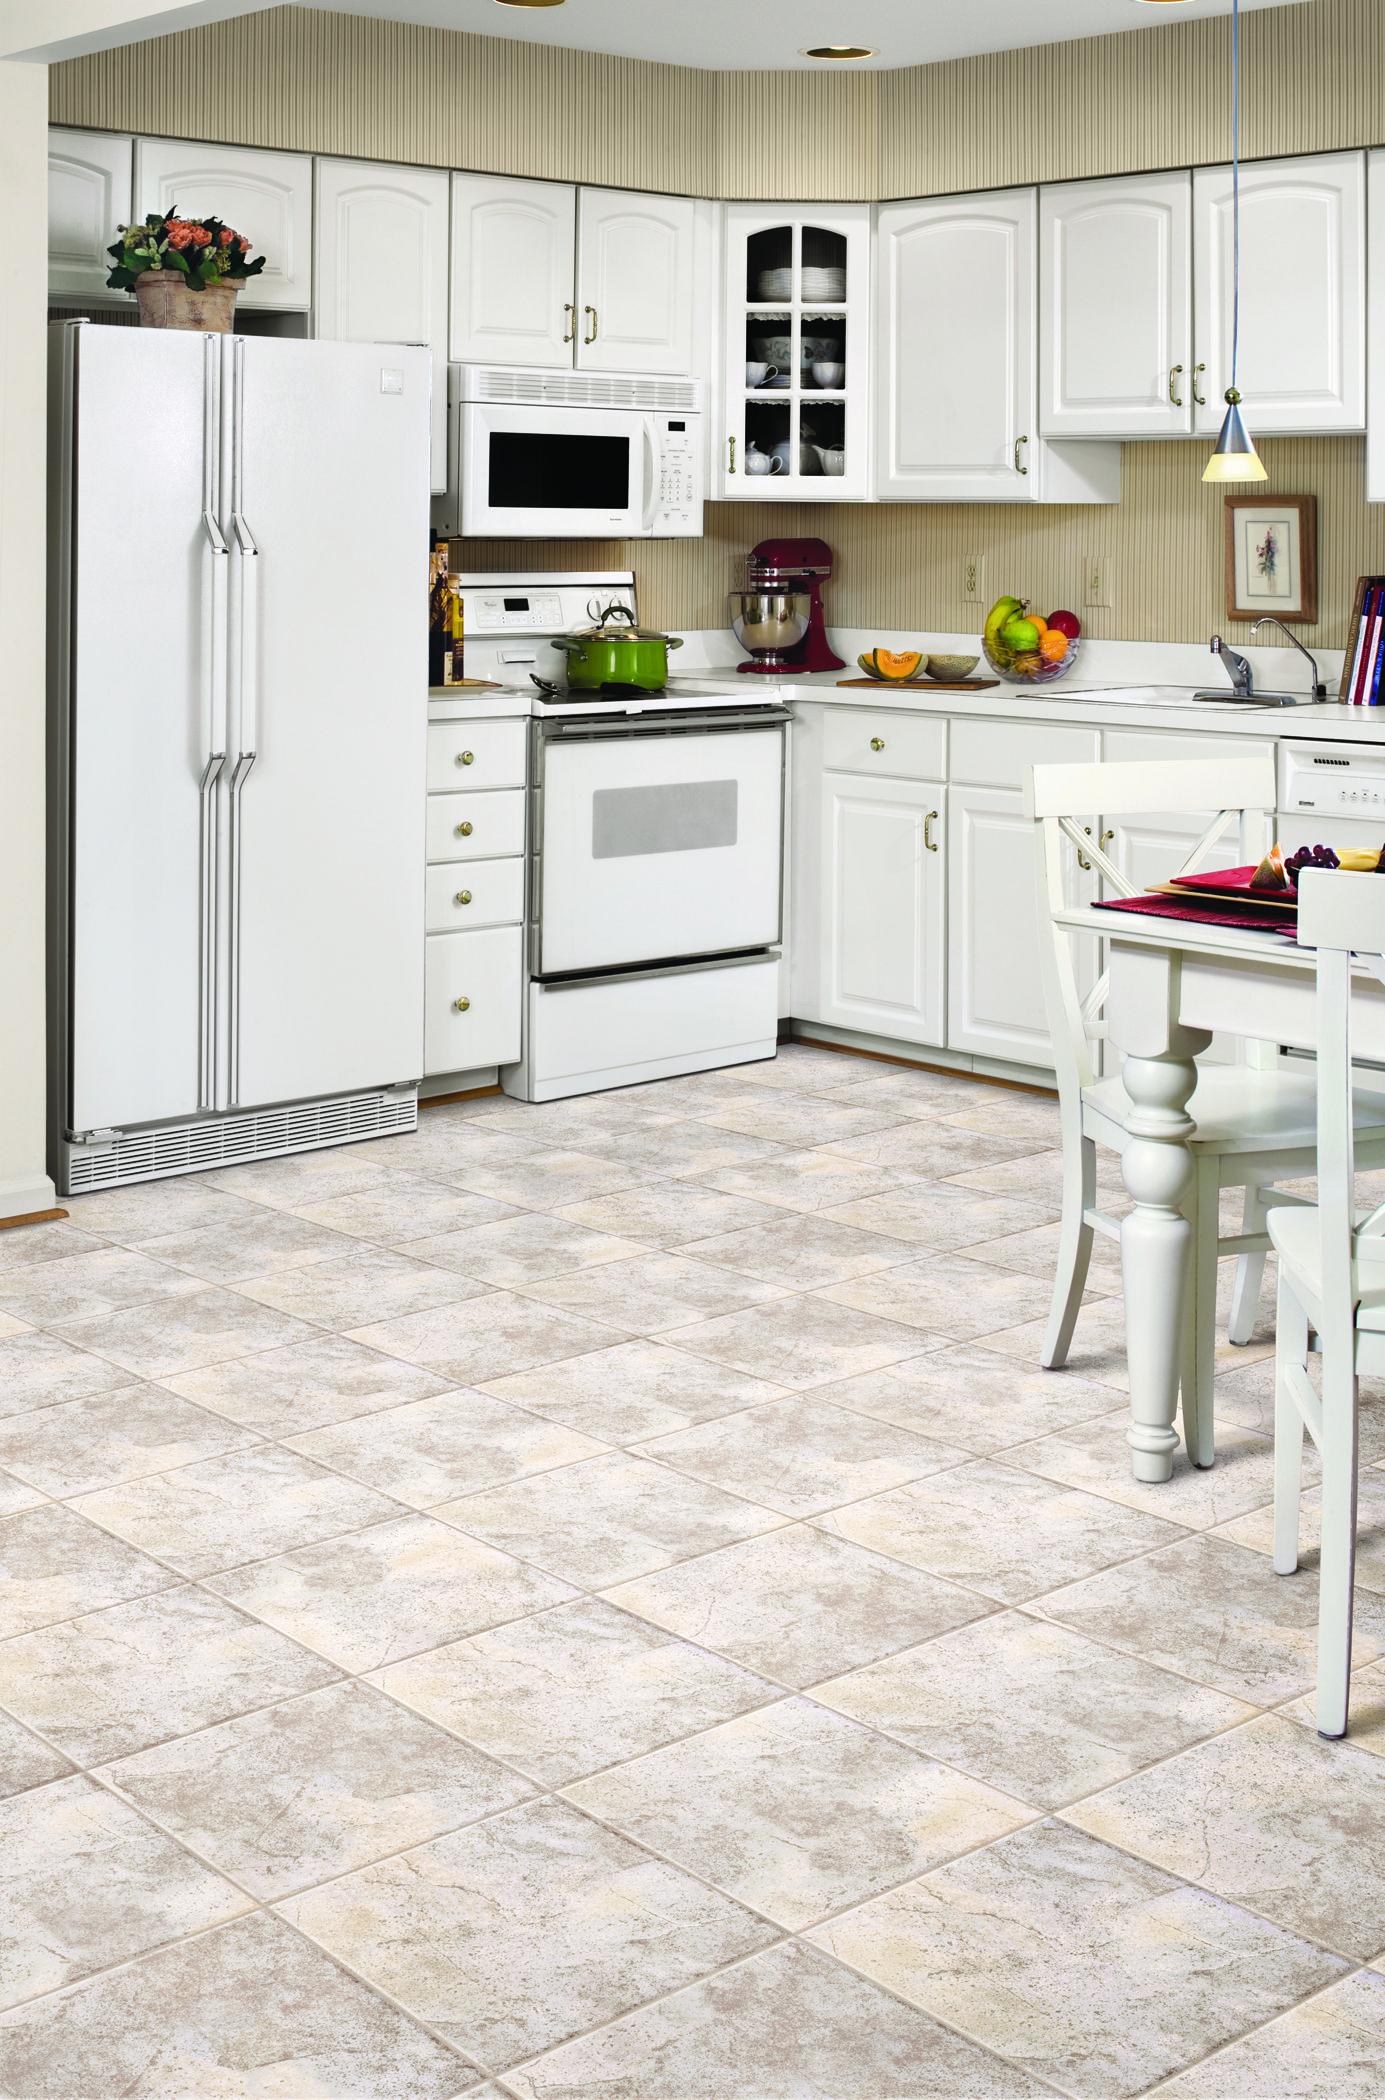 Congoleum Ovations Sunstone In Stone White Fabulousfloorsinc Biz Vinyl Tiles Flooring Luxury